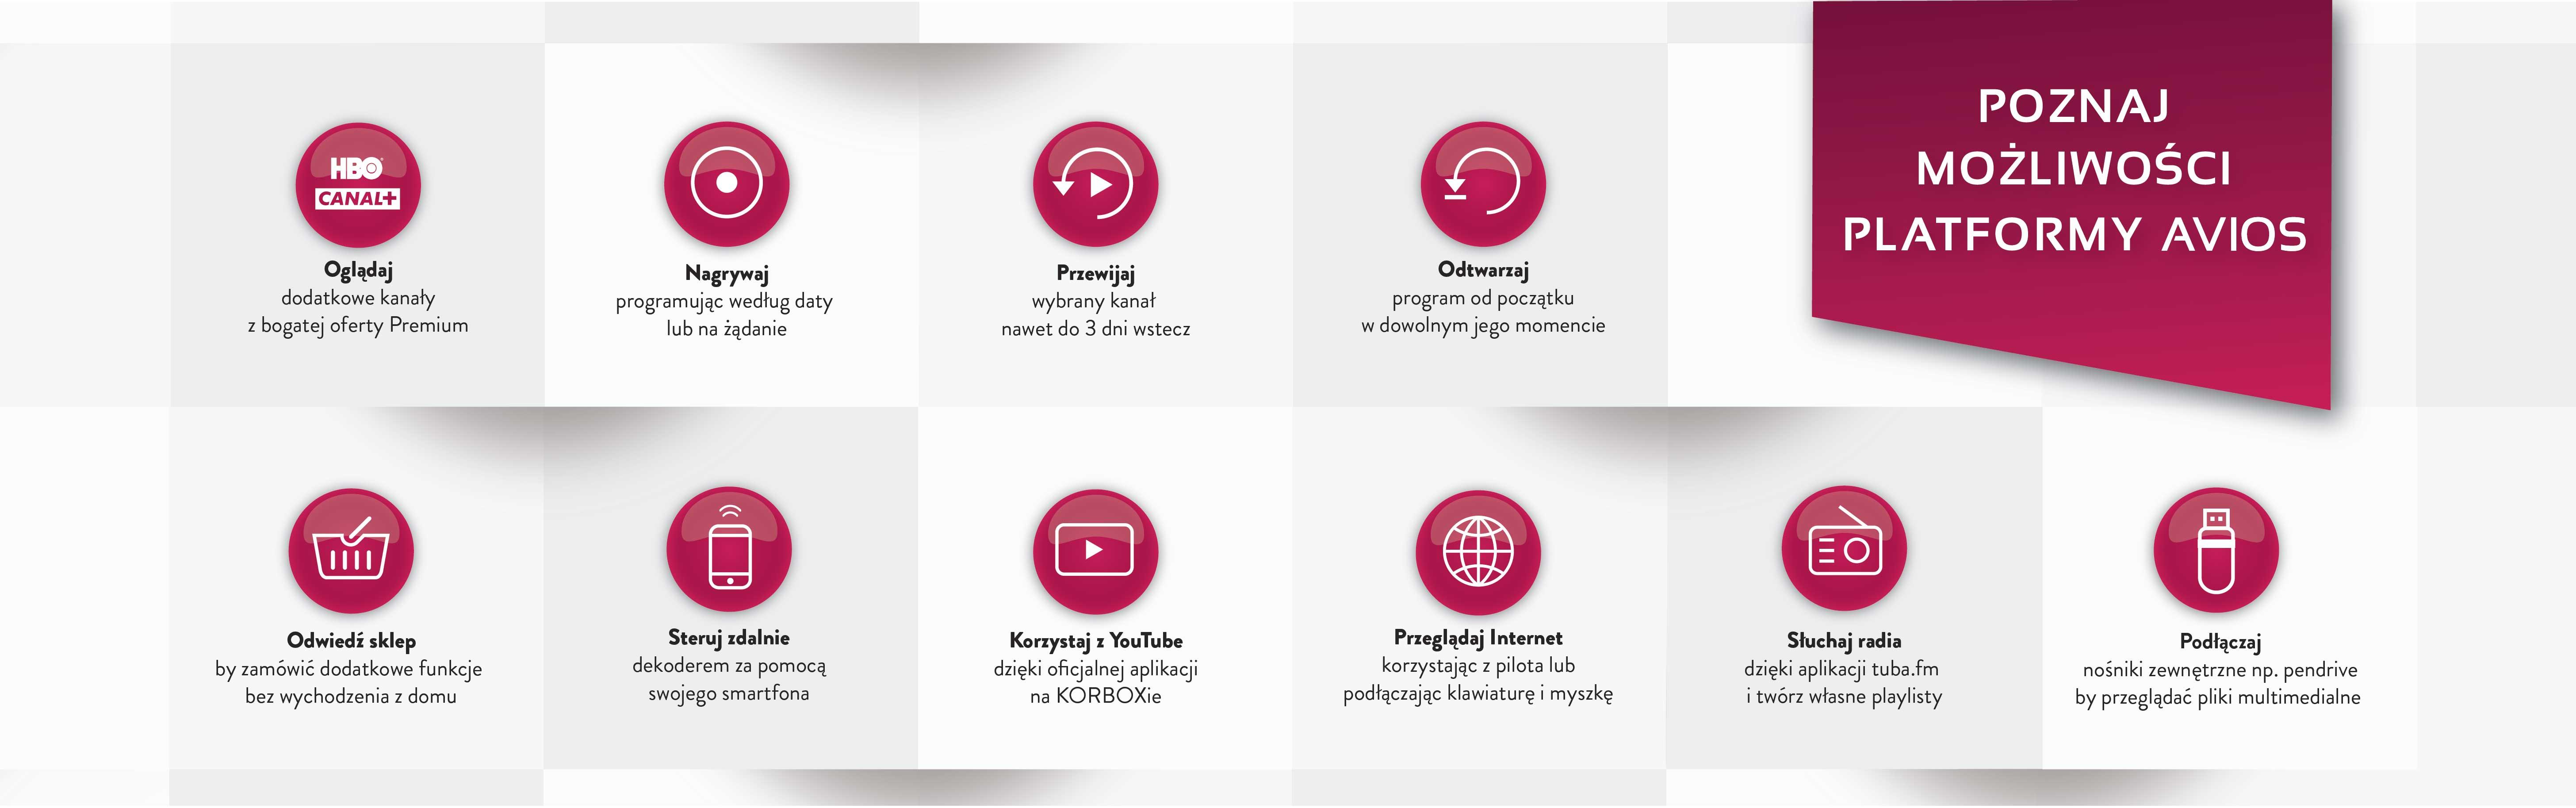 Unikatowa platforma telewizyjna IPTV 4K AVIOS